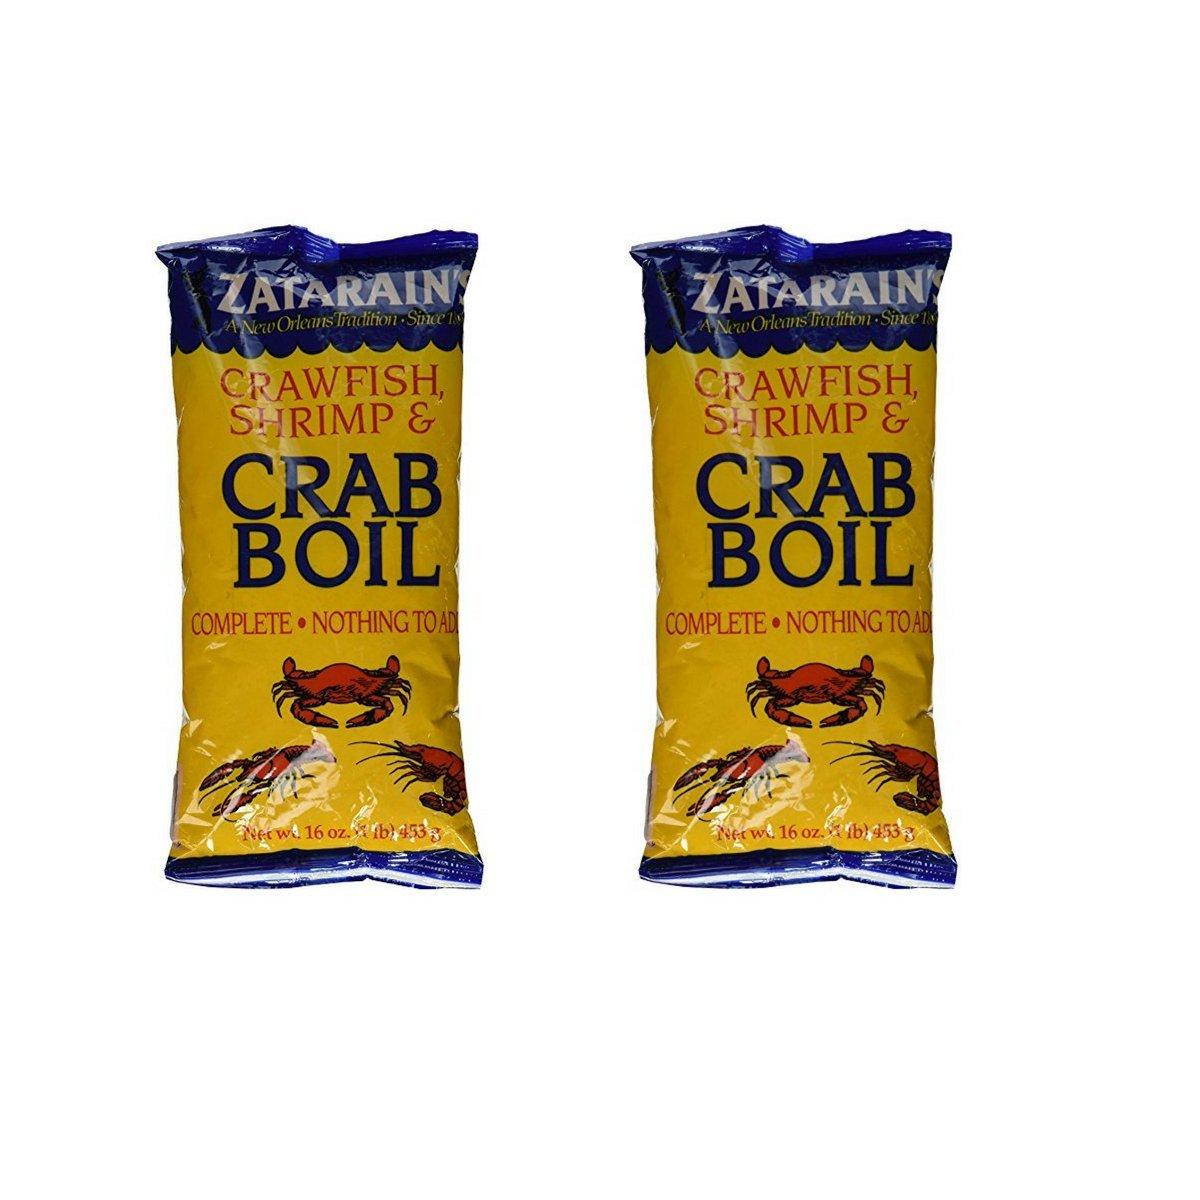 Zatarain's Shrimp & Crab Boil 16oz. (2pk.)